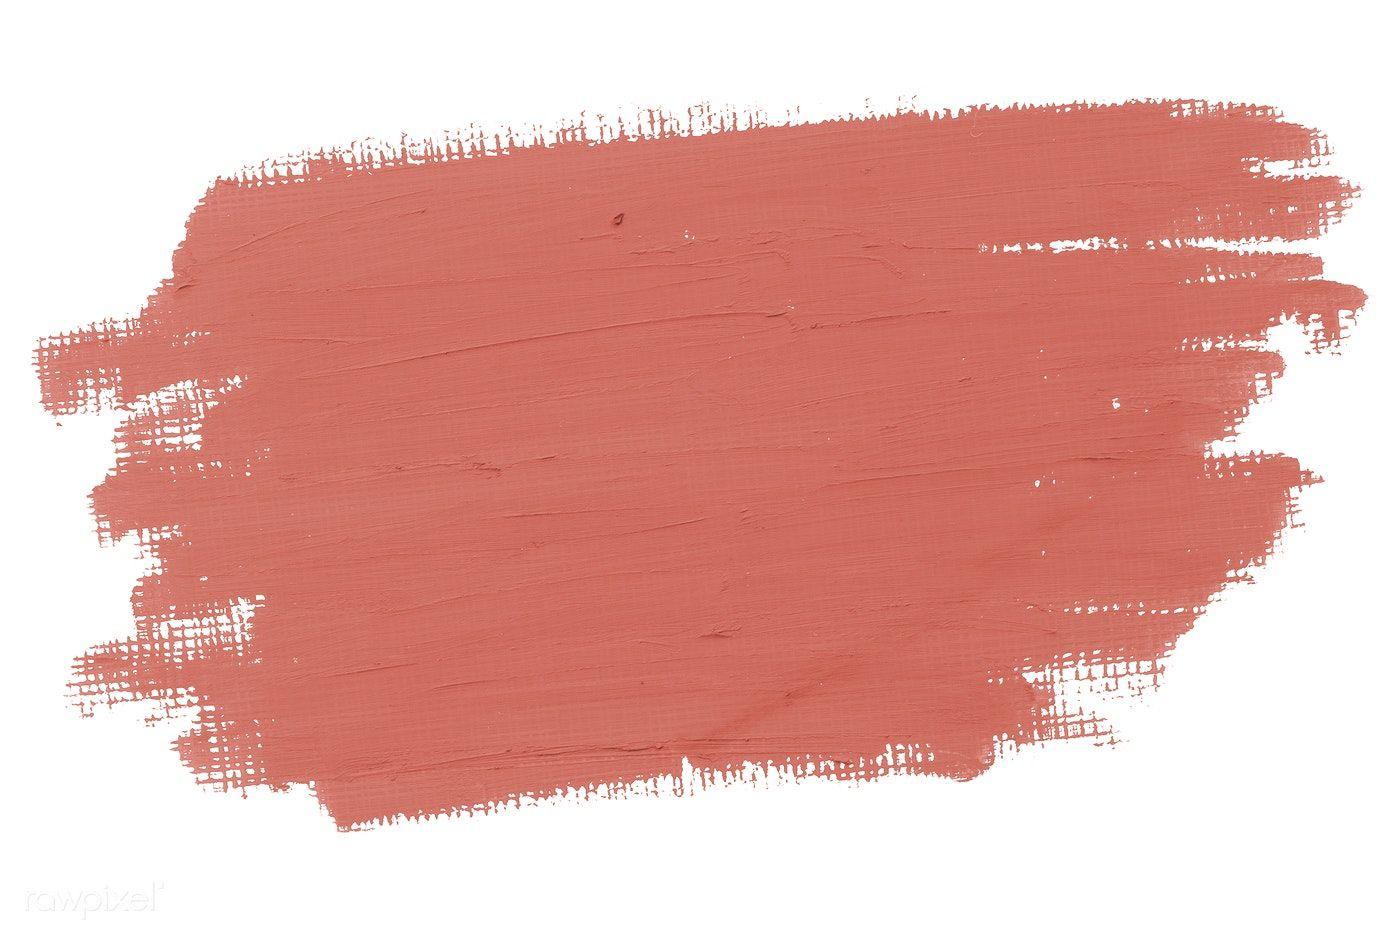 Download Premium Psd Of Pink Lipstick Smudge Badge Background 552837 Lipstick Smudge Pink Lipstick Color Wallpaper Iphone